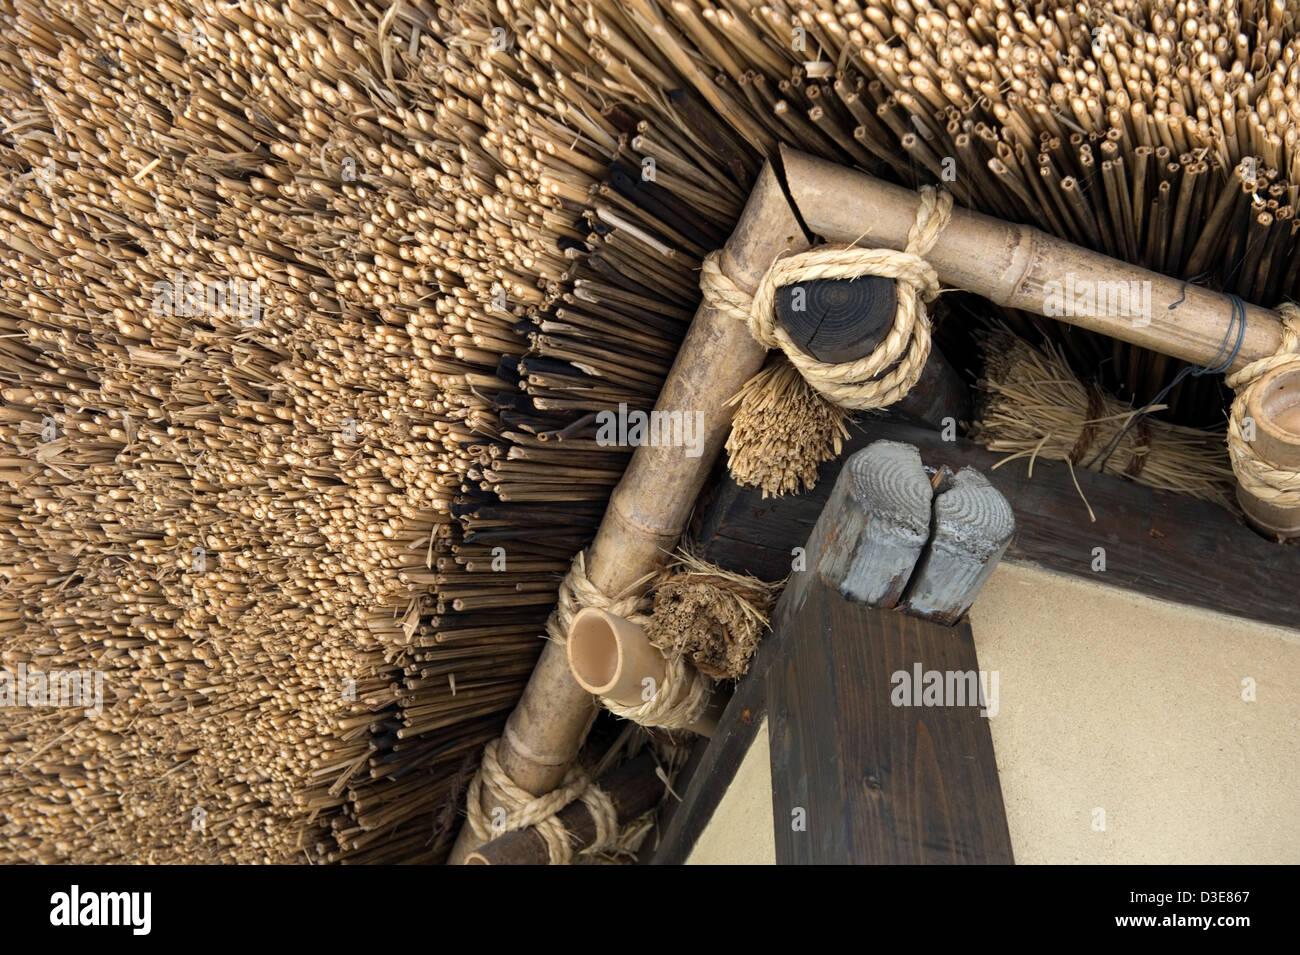 architectural detail photography. Perfect Architectural Closeup Architectural Detail Of Traditional Japanese Warabuki Or Kayabuki  Natural Thatched Roof Construction With Rope Lashing For Architectural Detail Photography E